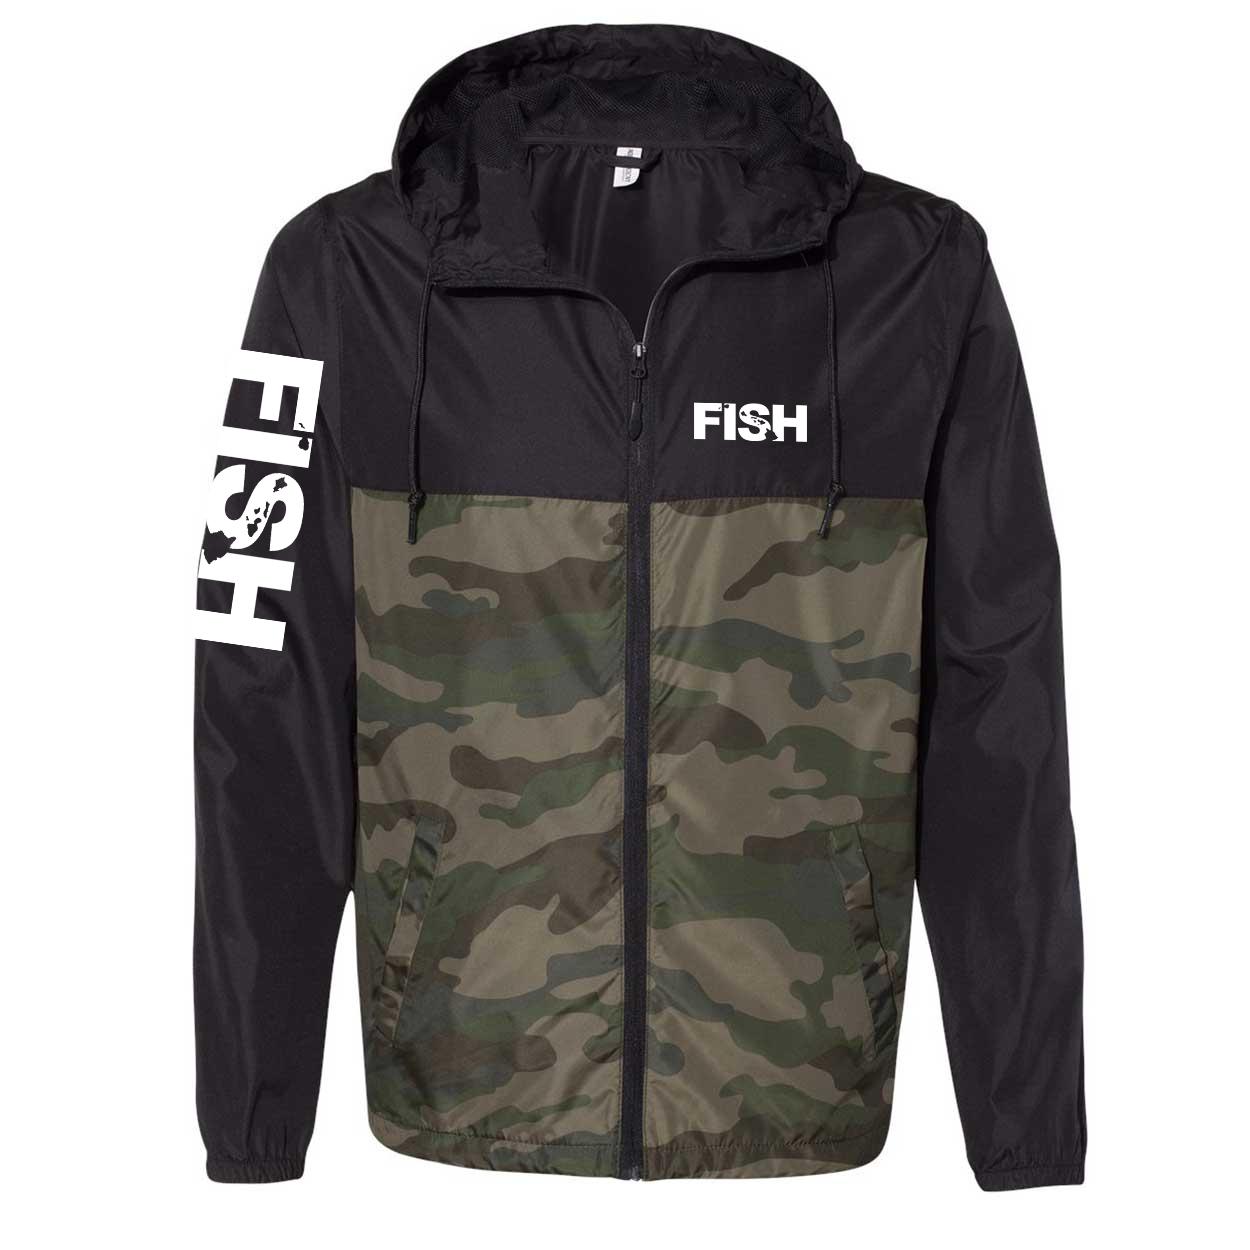 Fish Hawaii Classic Lightweight Windbreaker Black/Forest Camo (White Logo)